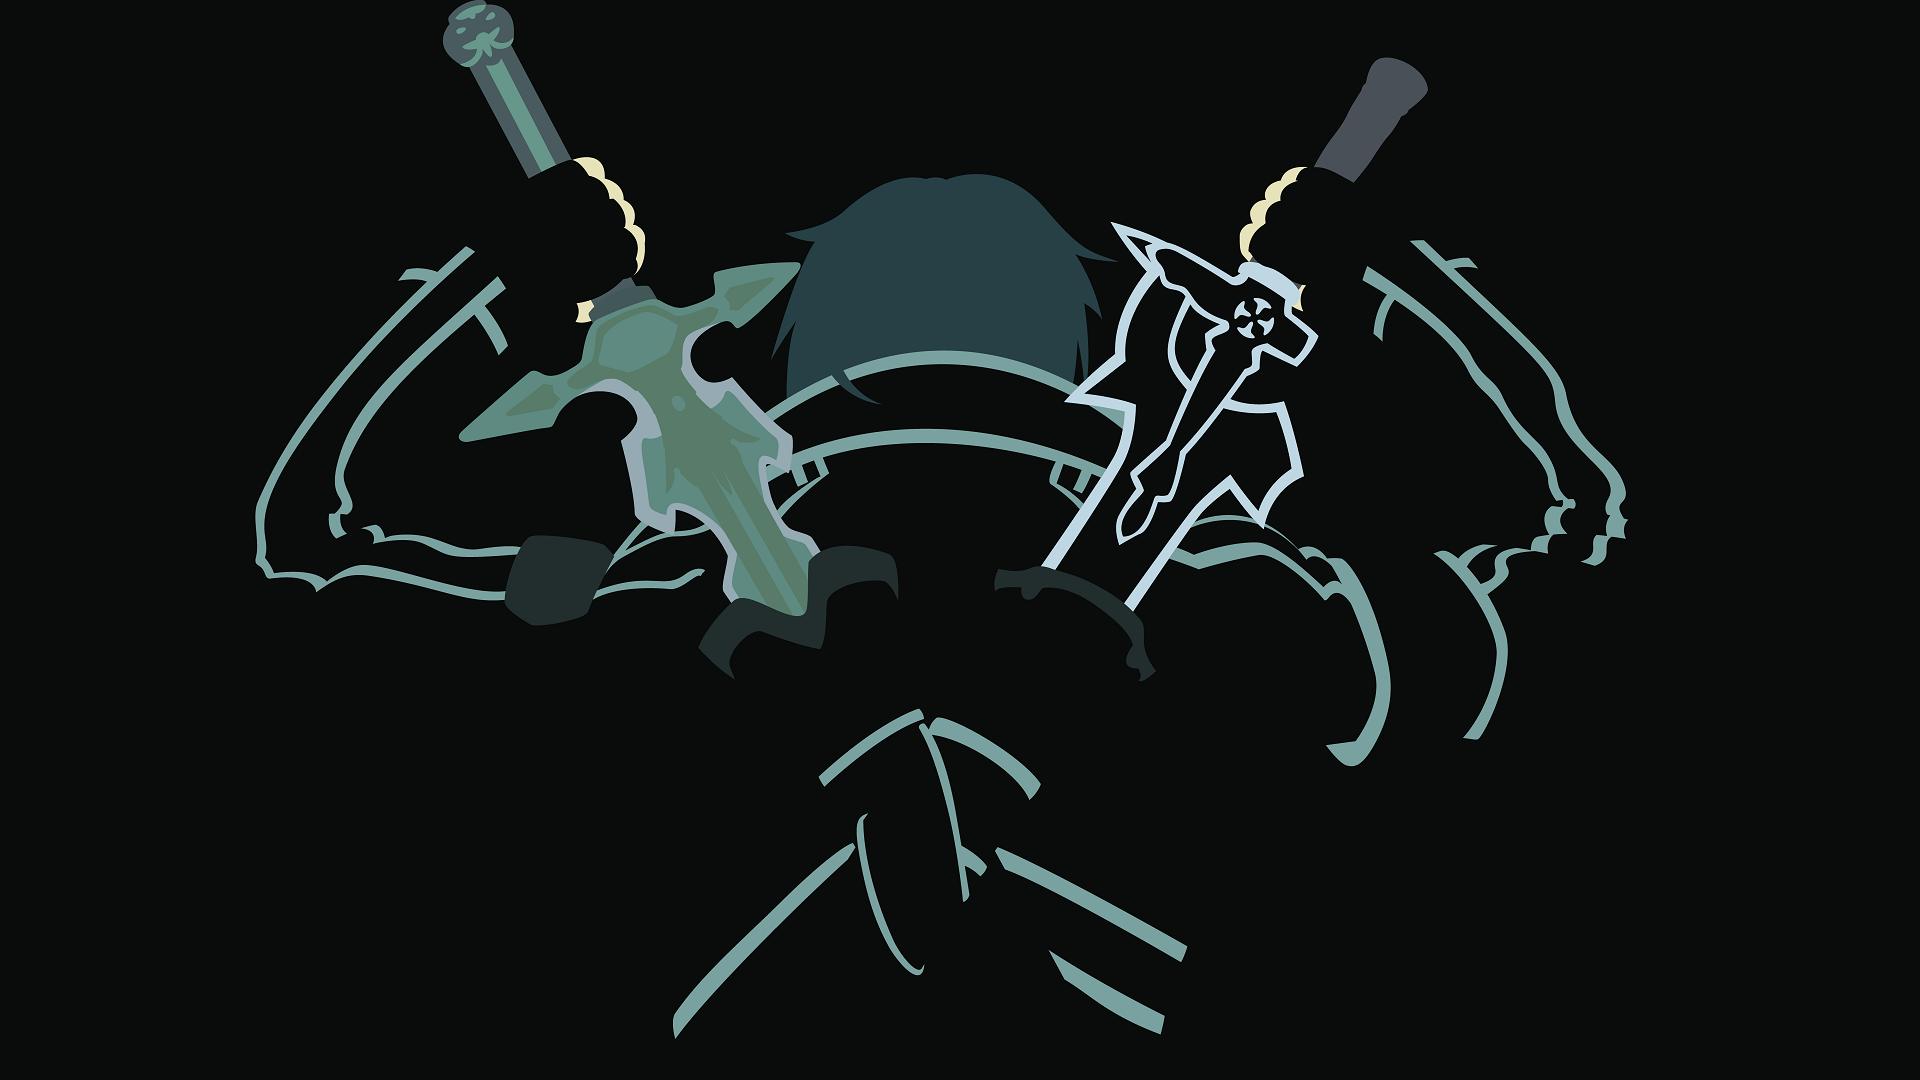 Sword art online full hd wallpaper and background image for Minimal art online